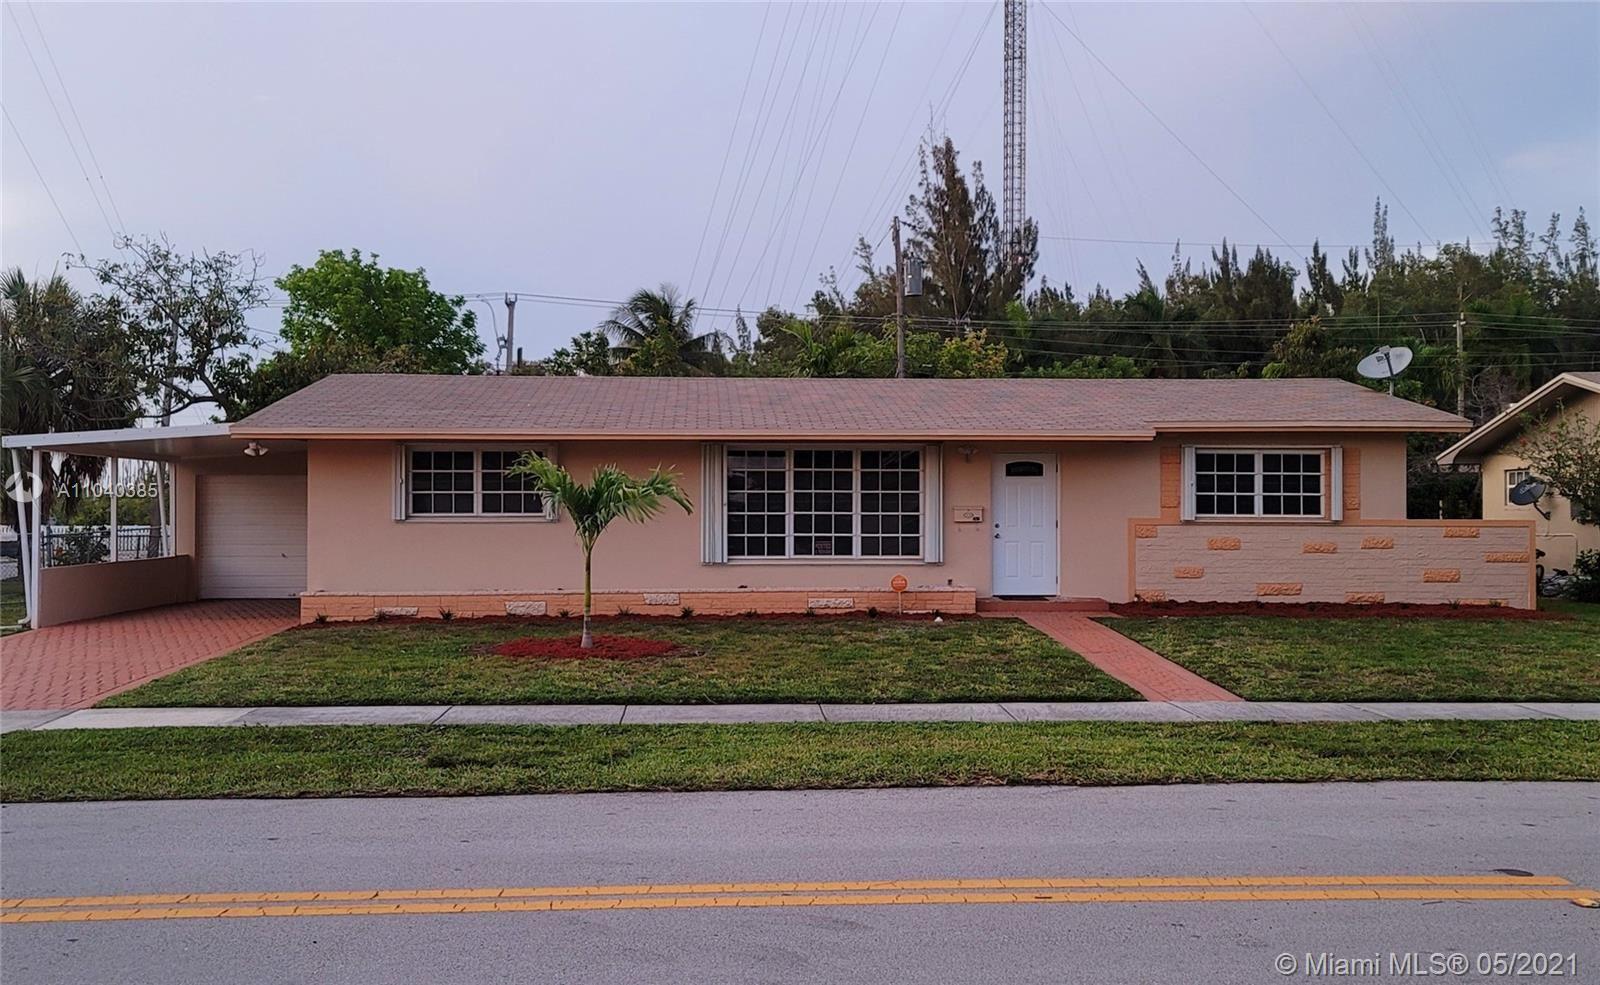 361 NW 206th Ter, Miami Gardens, FL 33169 - #: A11040385